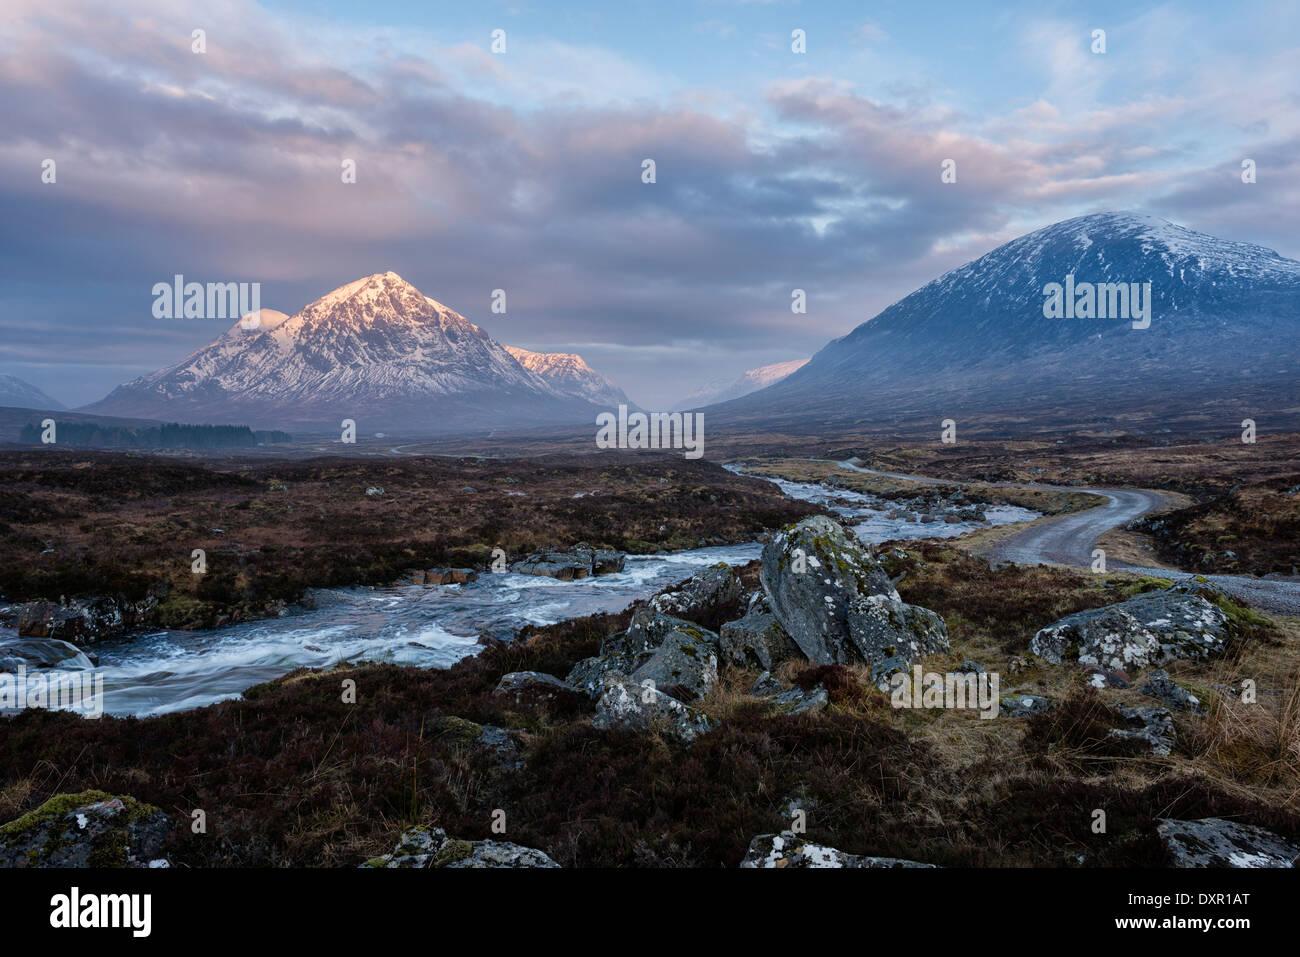 On Rannoch Moor  west of Glencoe looking towards the entrance to Glen Coe - Stock Image